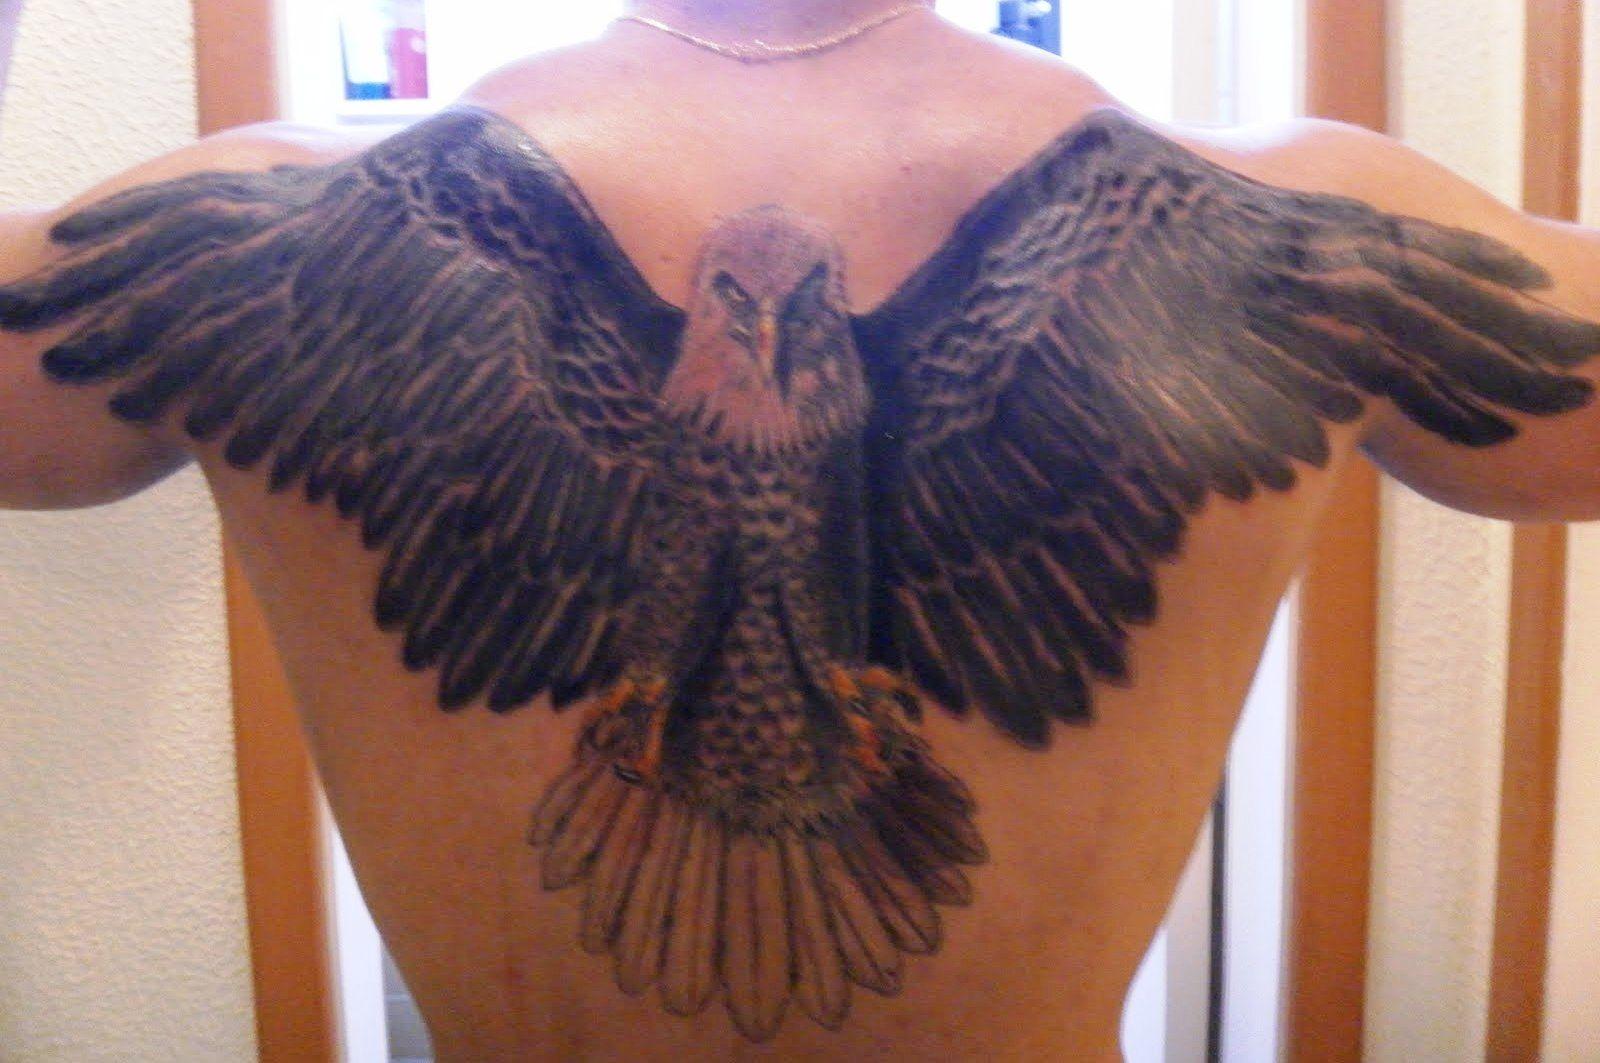 Pin de Monique T em Tatts Tatuagem aguia, Tatuagem